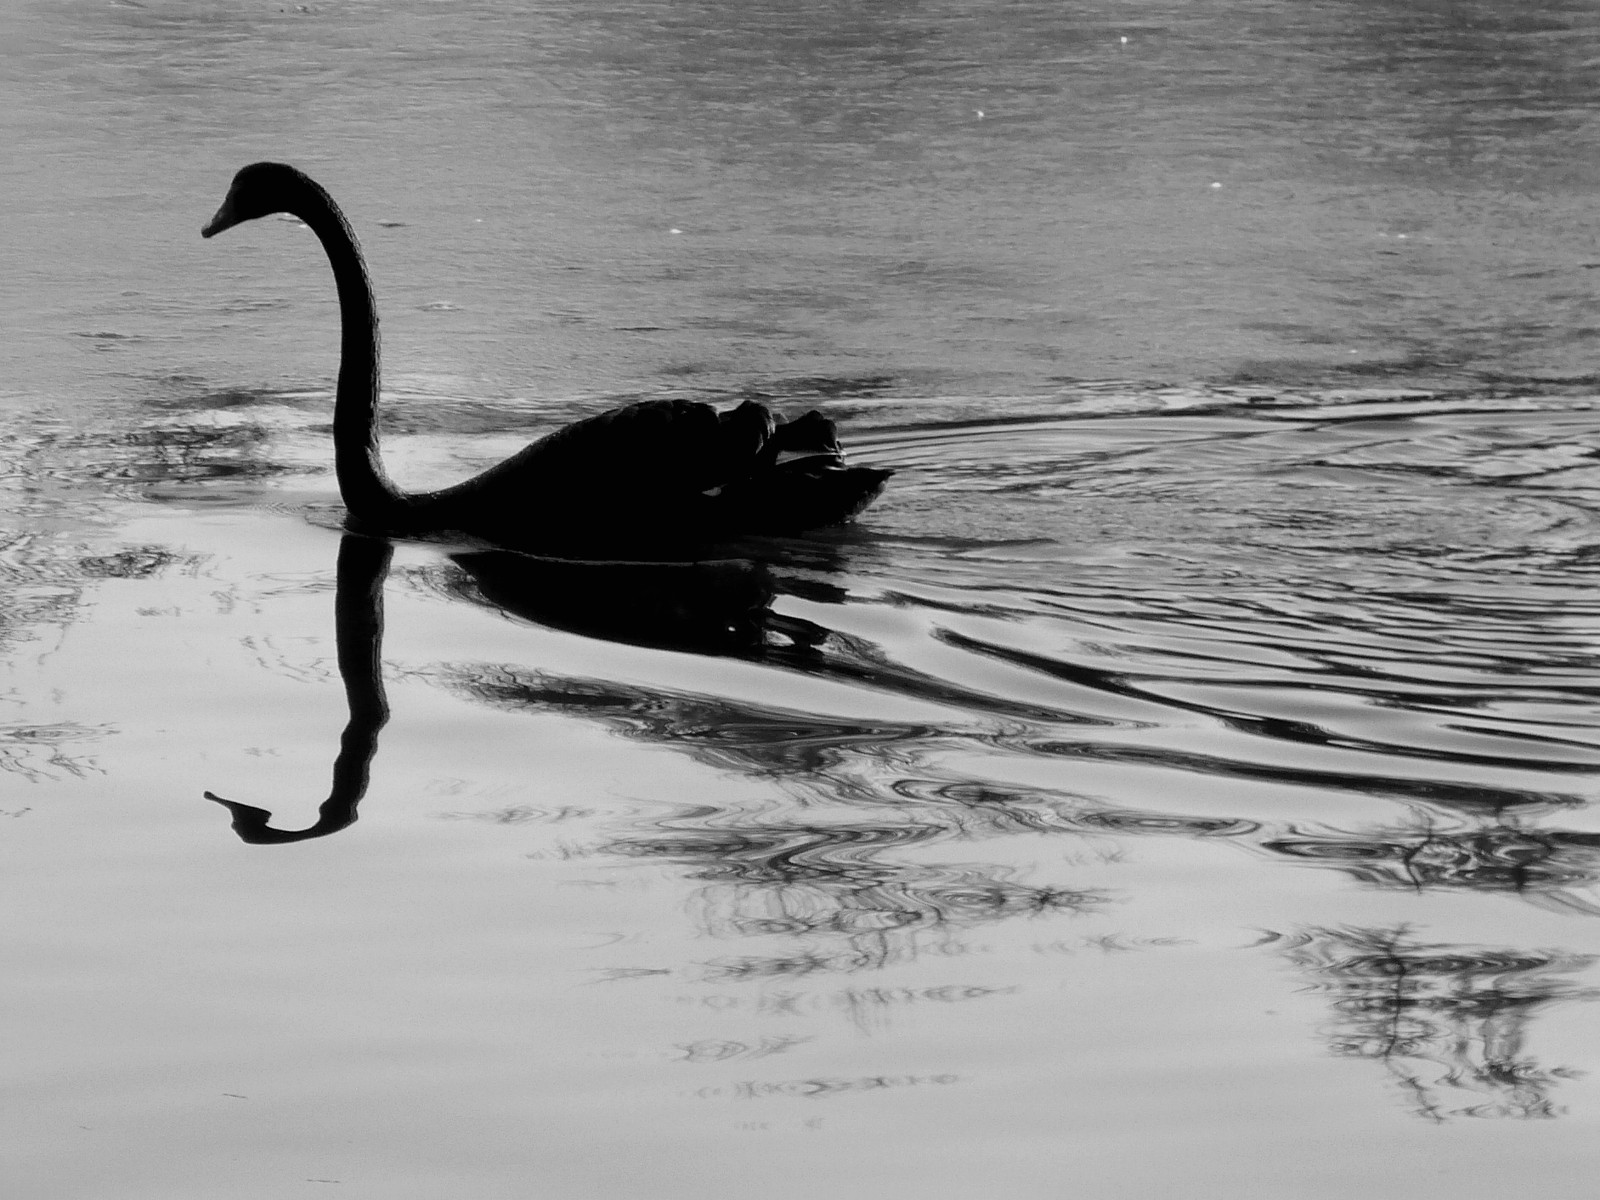 http://fondsecranwallpapers.free.fr/wallpaper-nature-et-animaux/img/images/wallpaper-animaux-cygne-noir-black.jpg